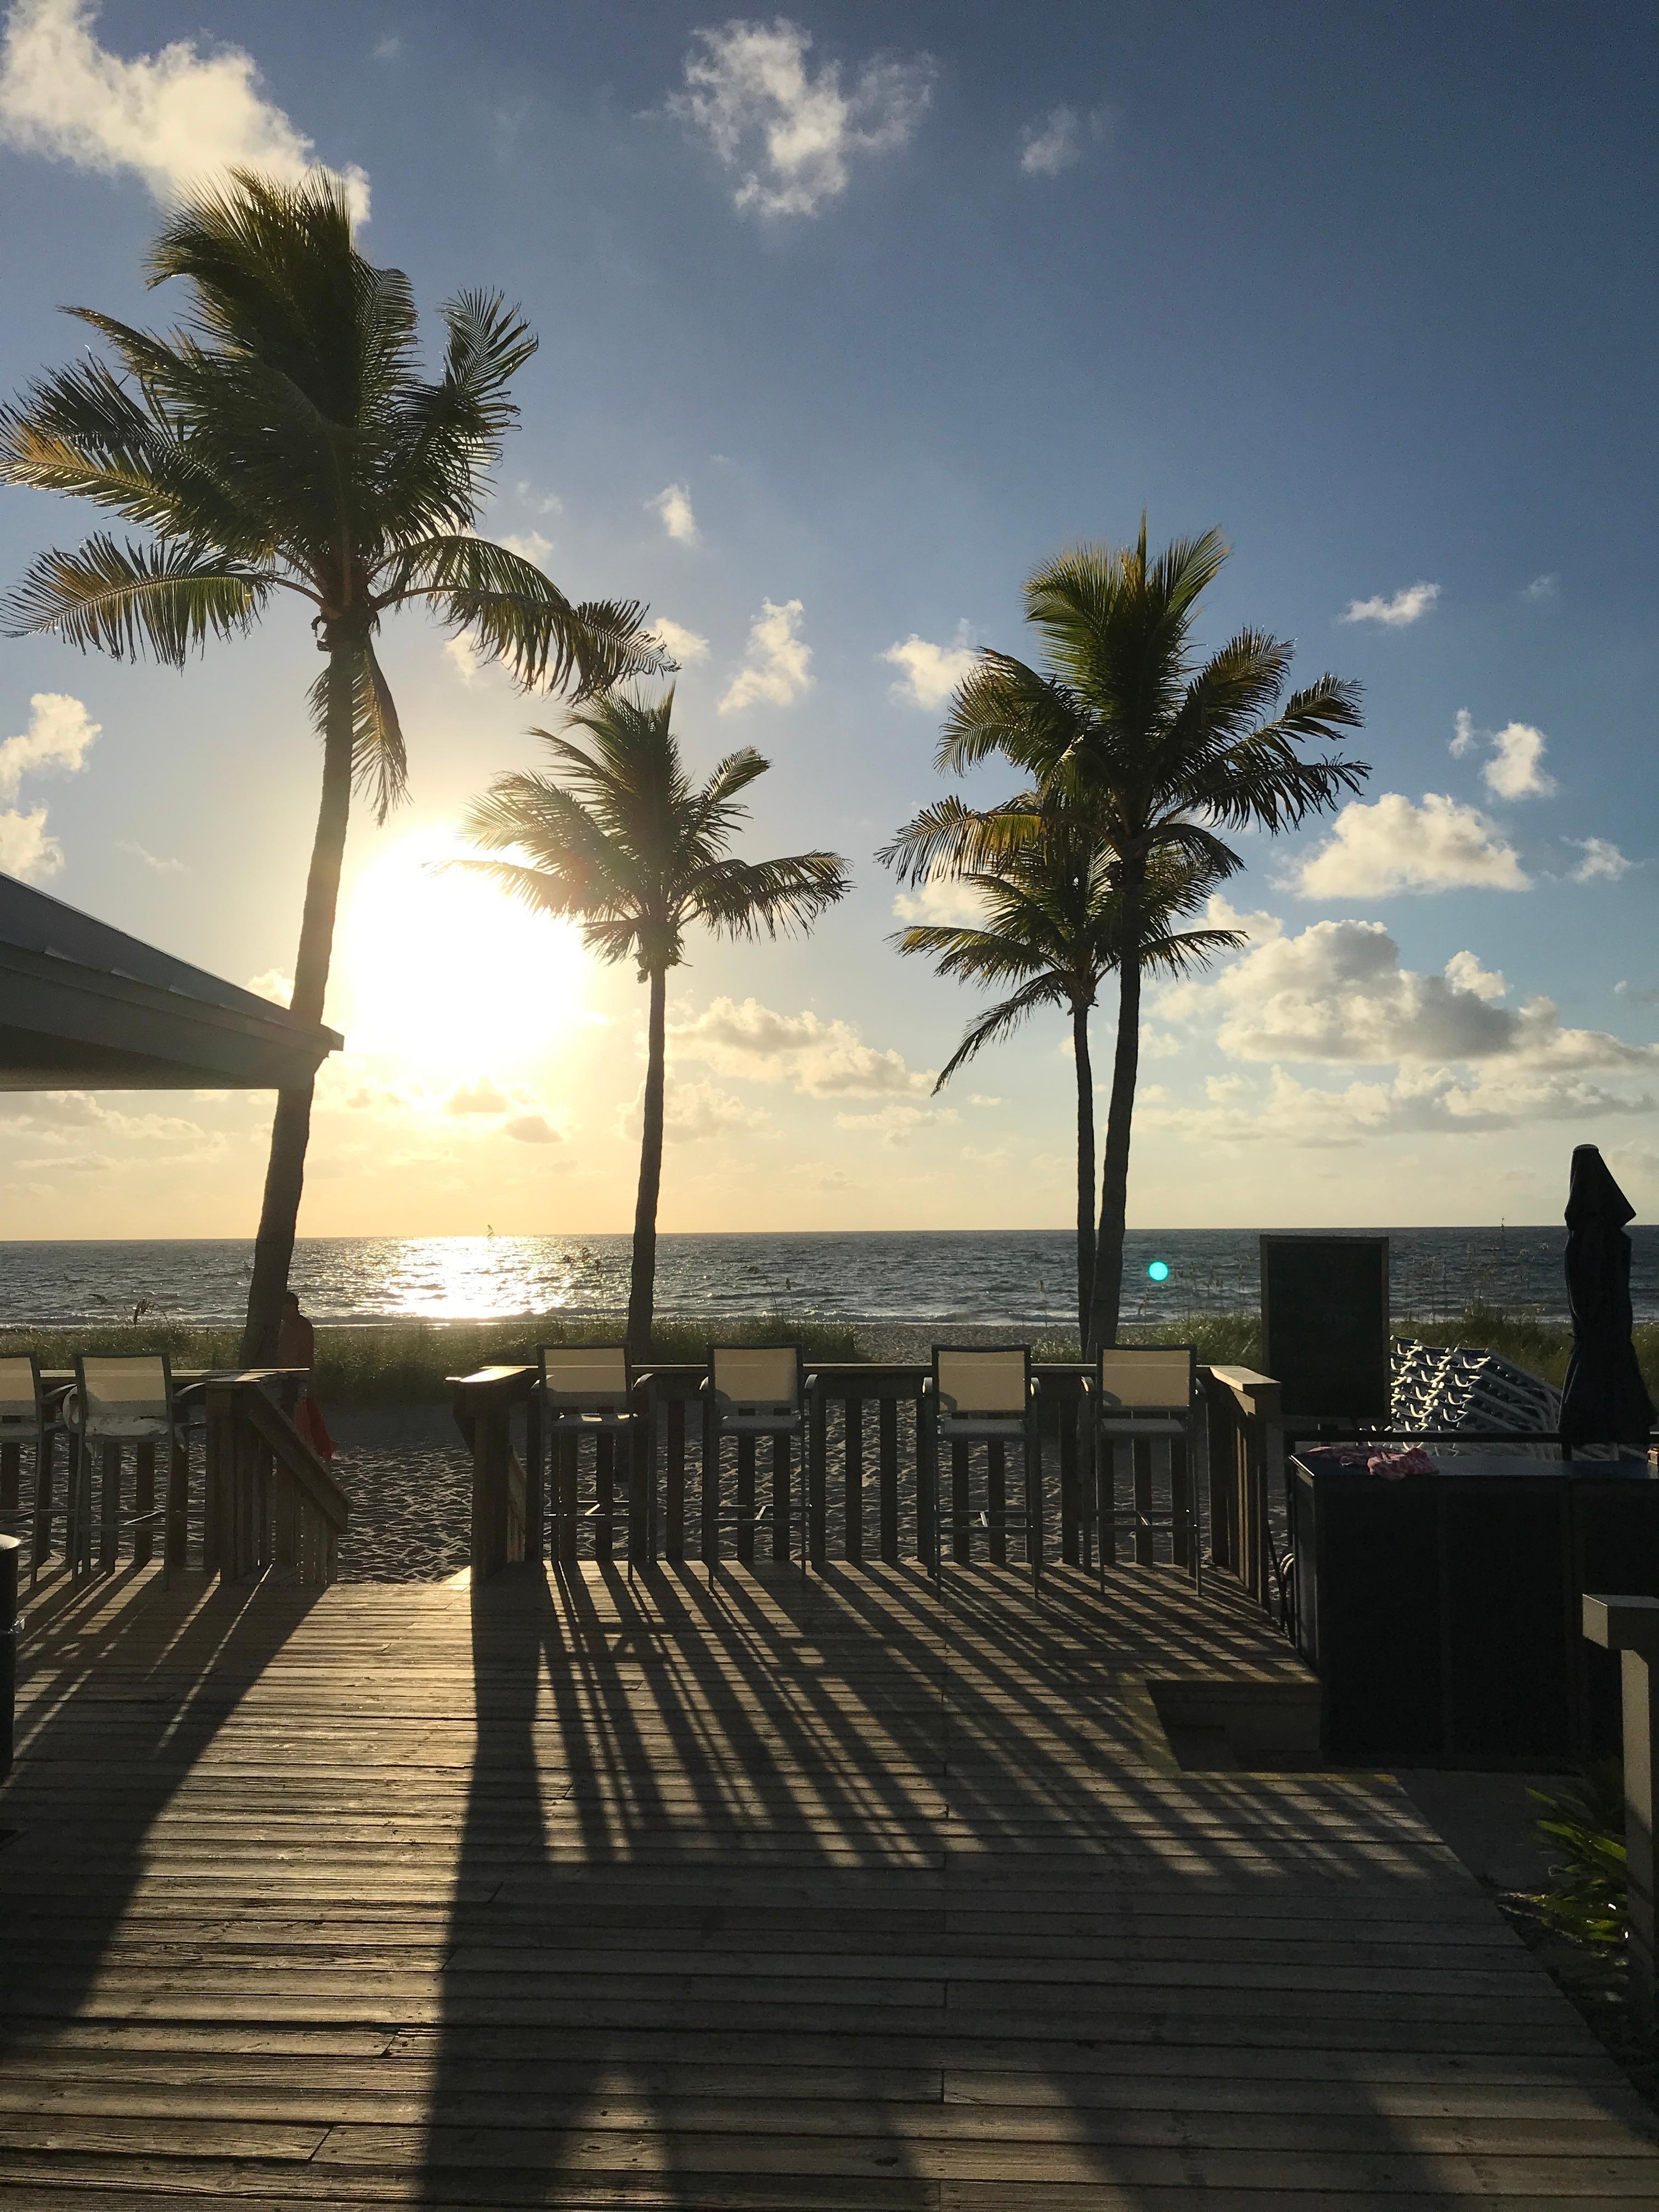 Plunge Beach Hotel In Fort Lauderdale